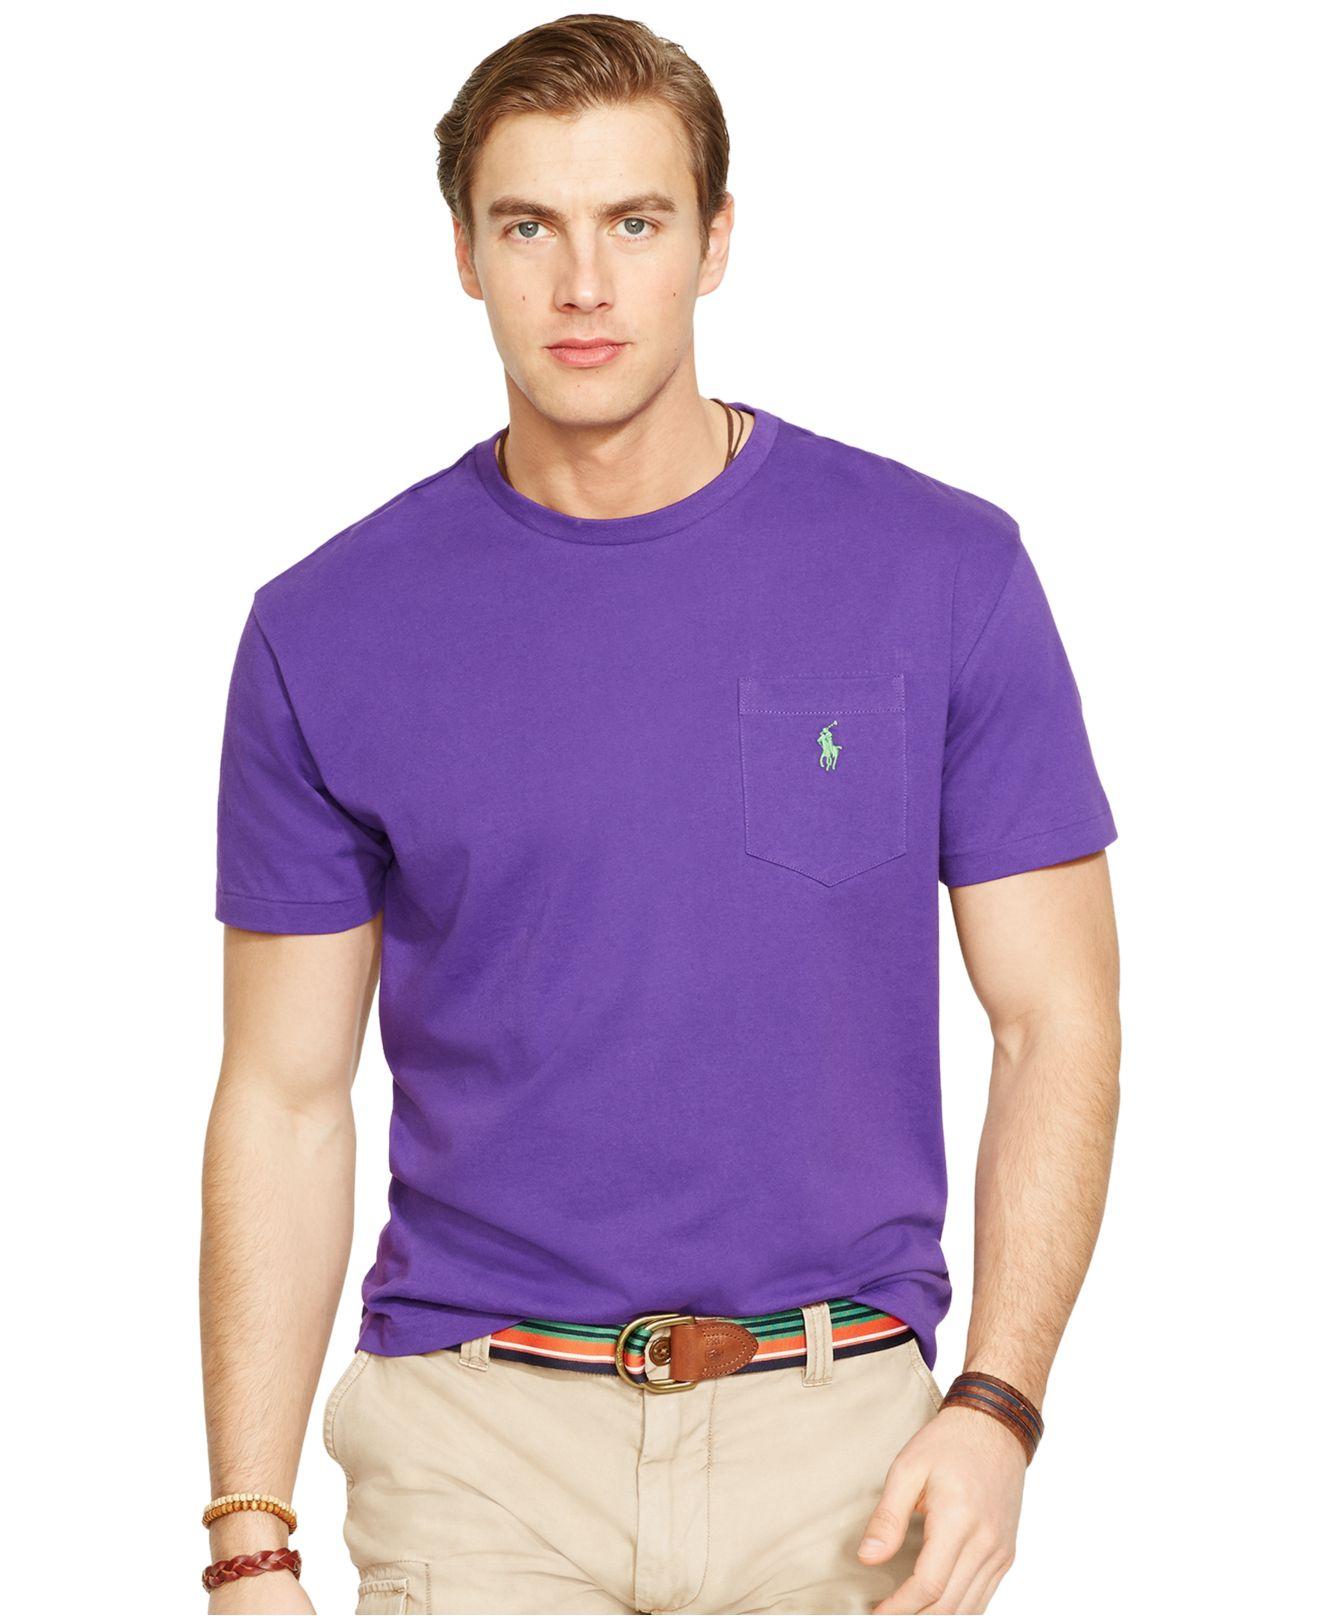 7b9e1fd1 Polo Ralph Lauren Crew-neck Pocket T-shirt in Purple for Men - Lyst